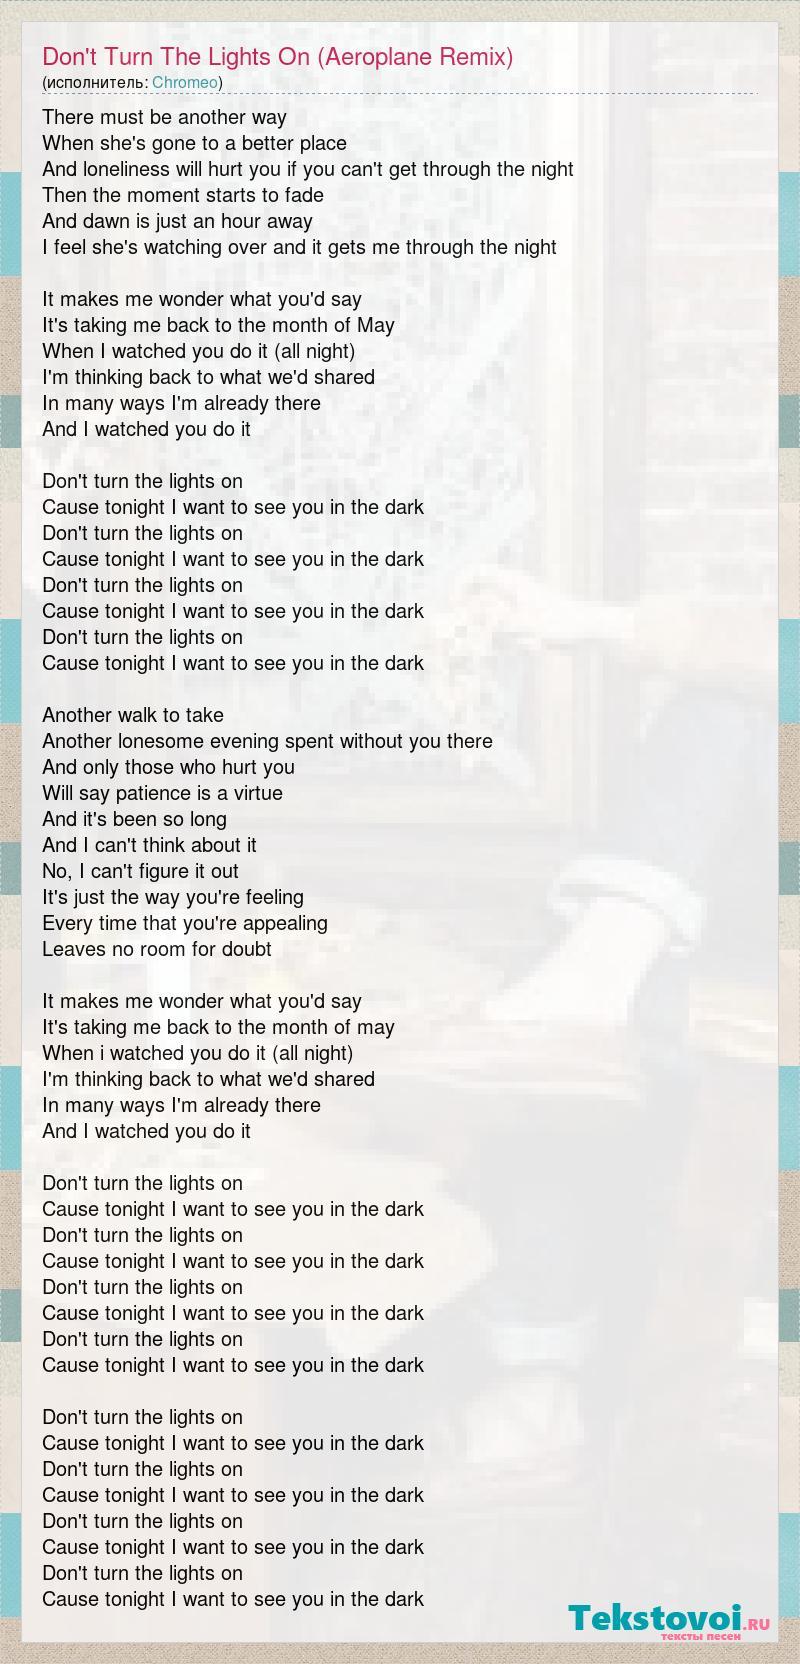 Chromeo: Don't Turn The Lights On (Aeroplane Remix) слова песни